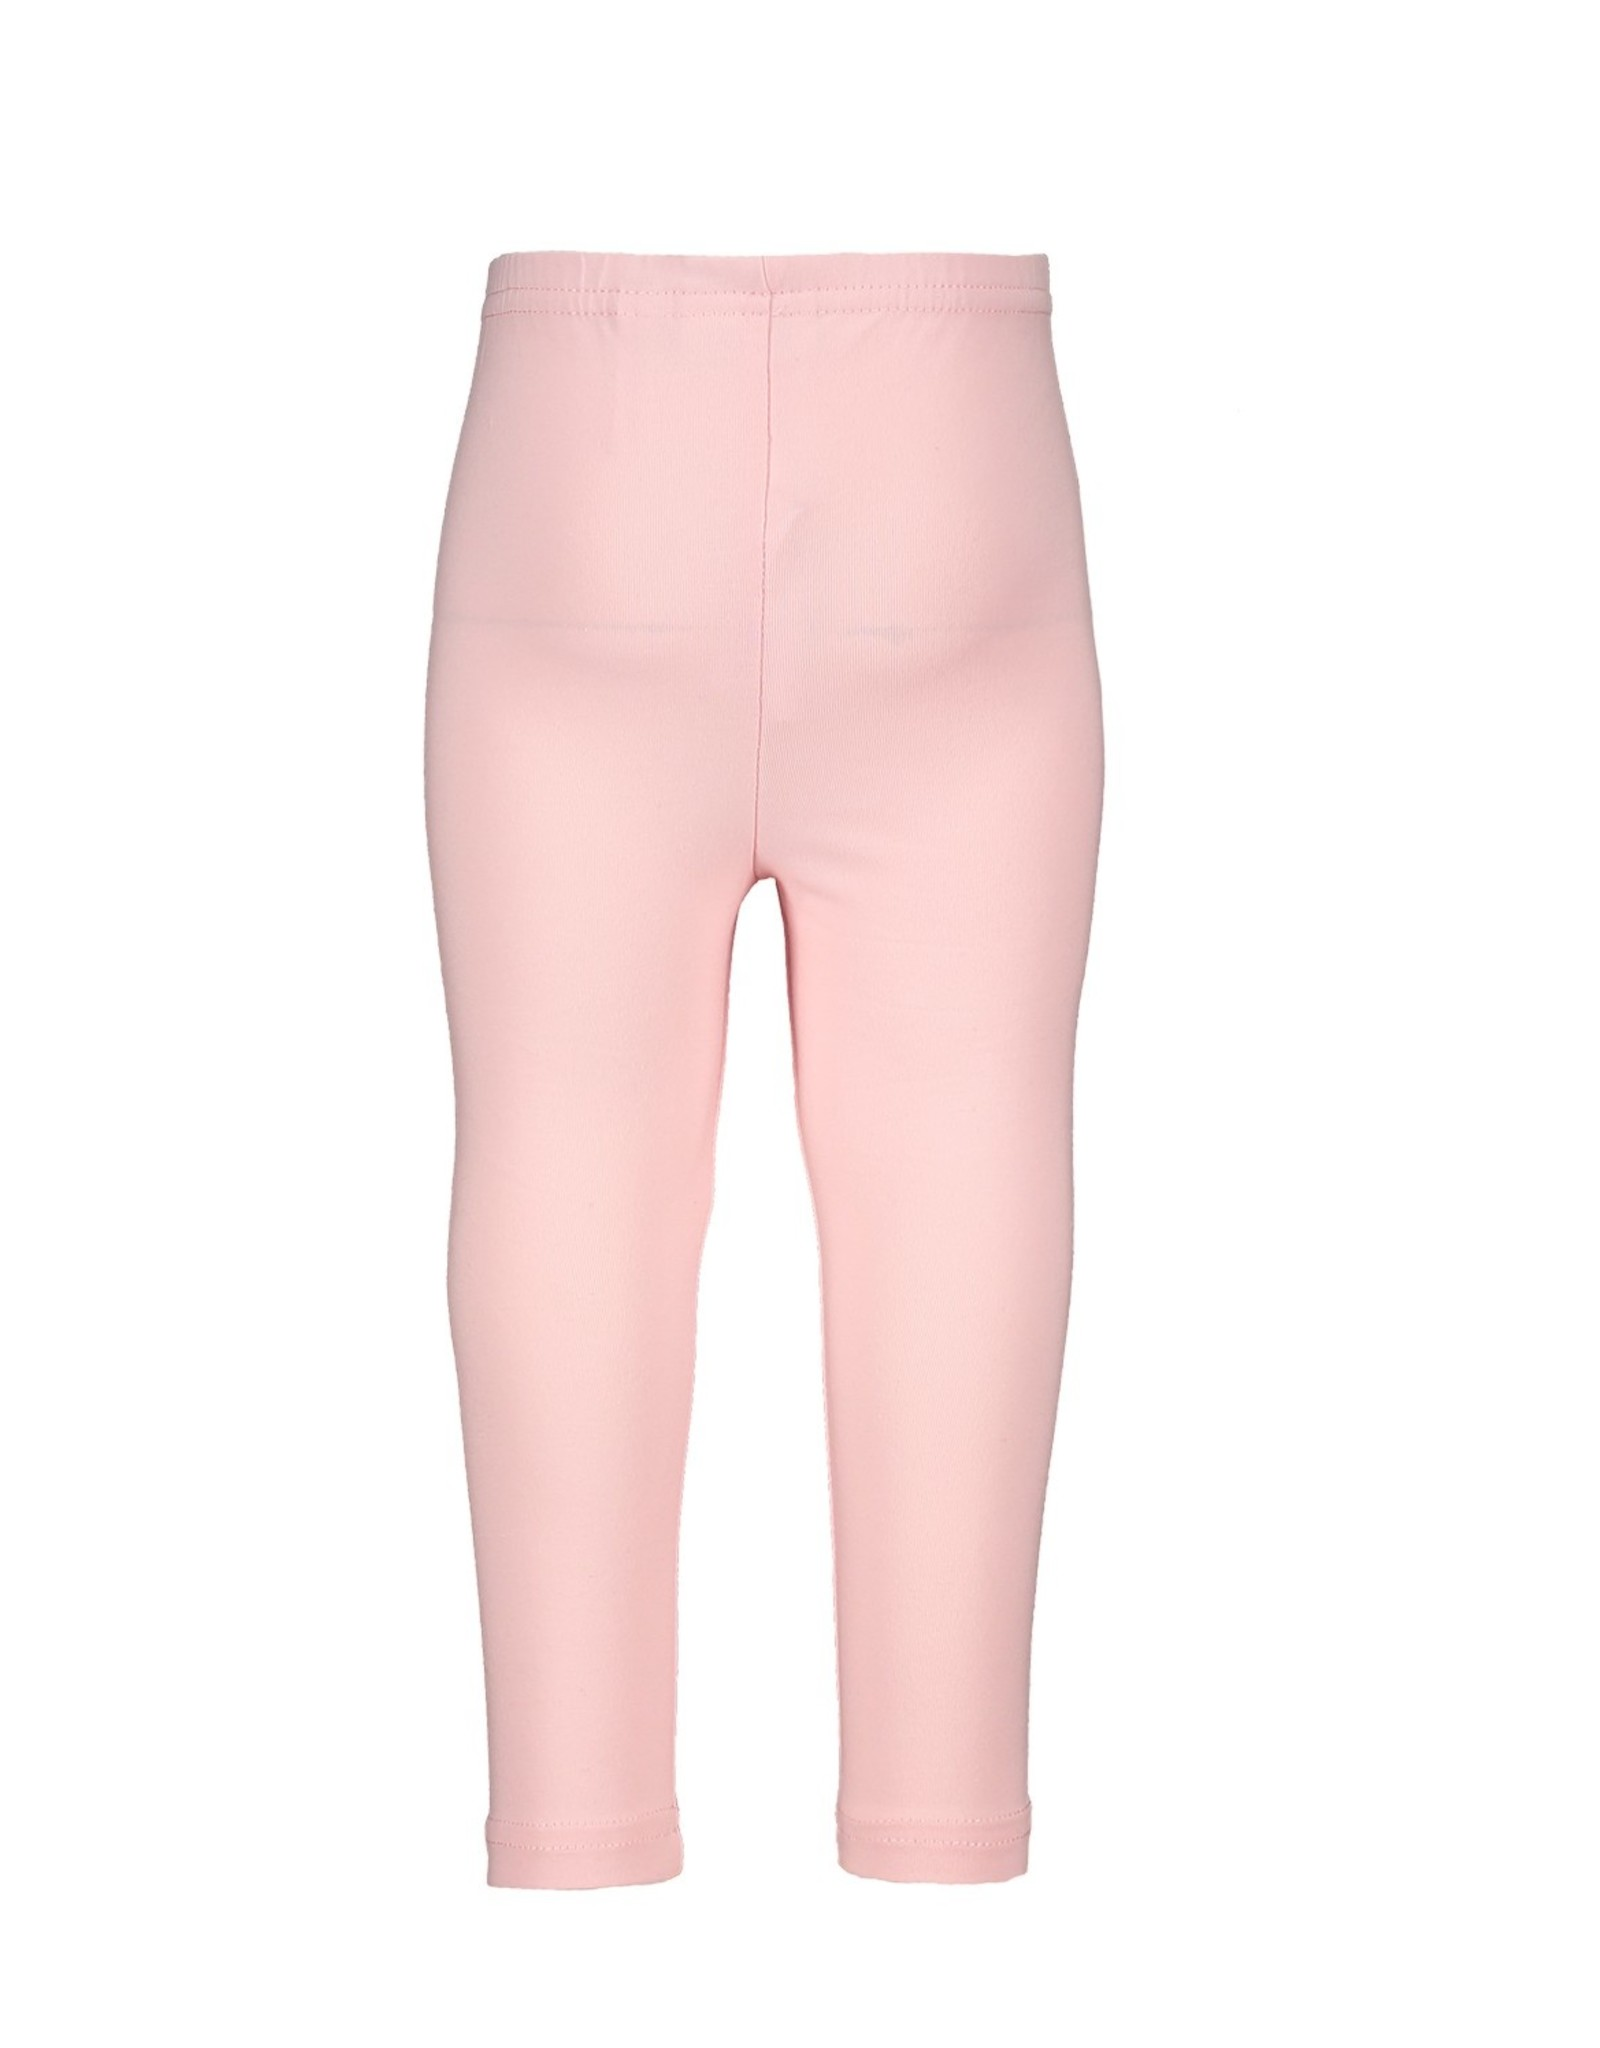 Bampidano Little Bampidano Baby Girls legging Coco plain/allover print, light pink